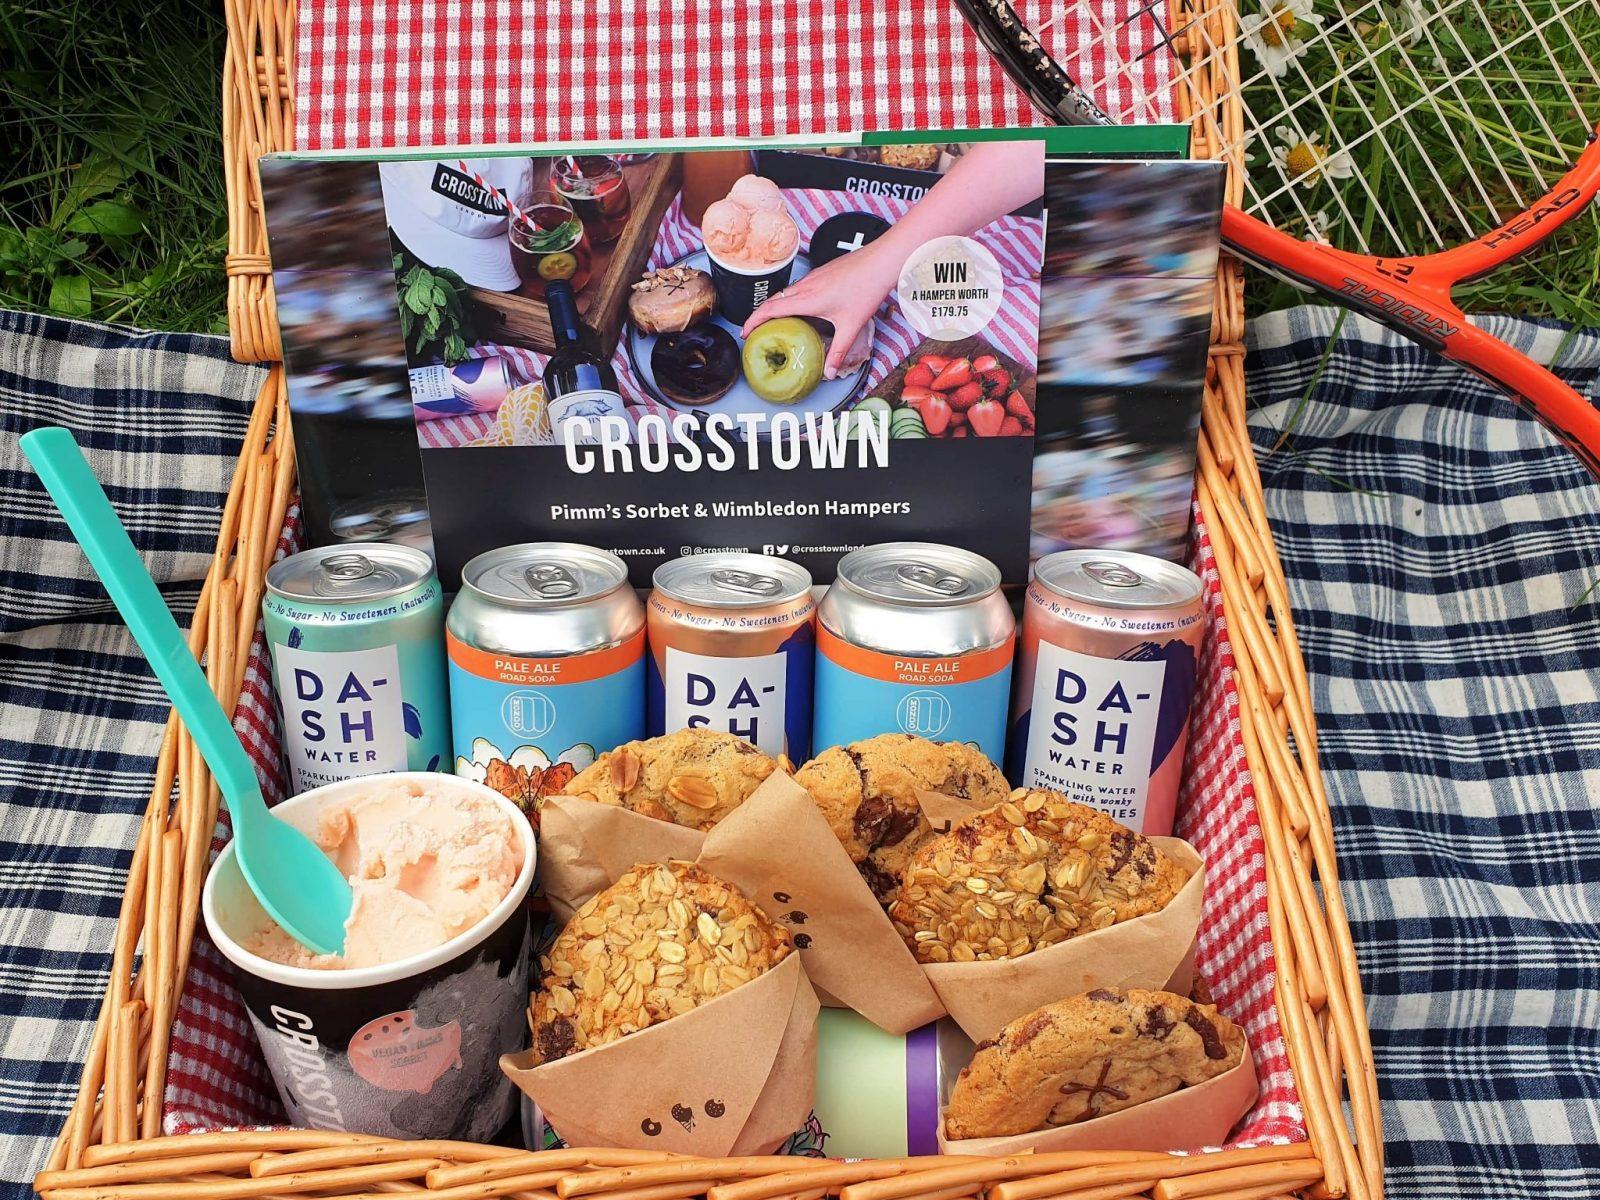 Crosstown - Game, Set, Match box-